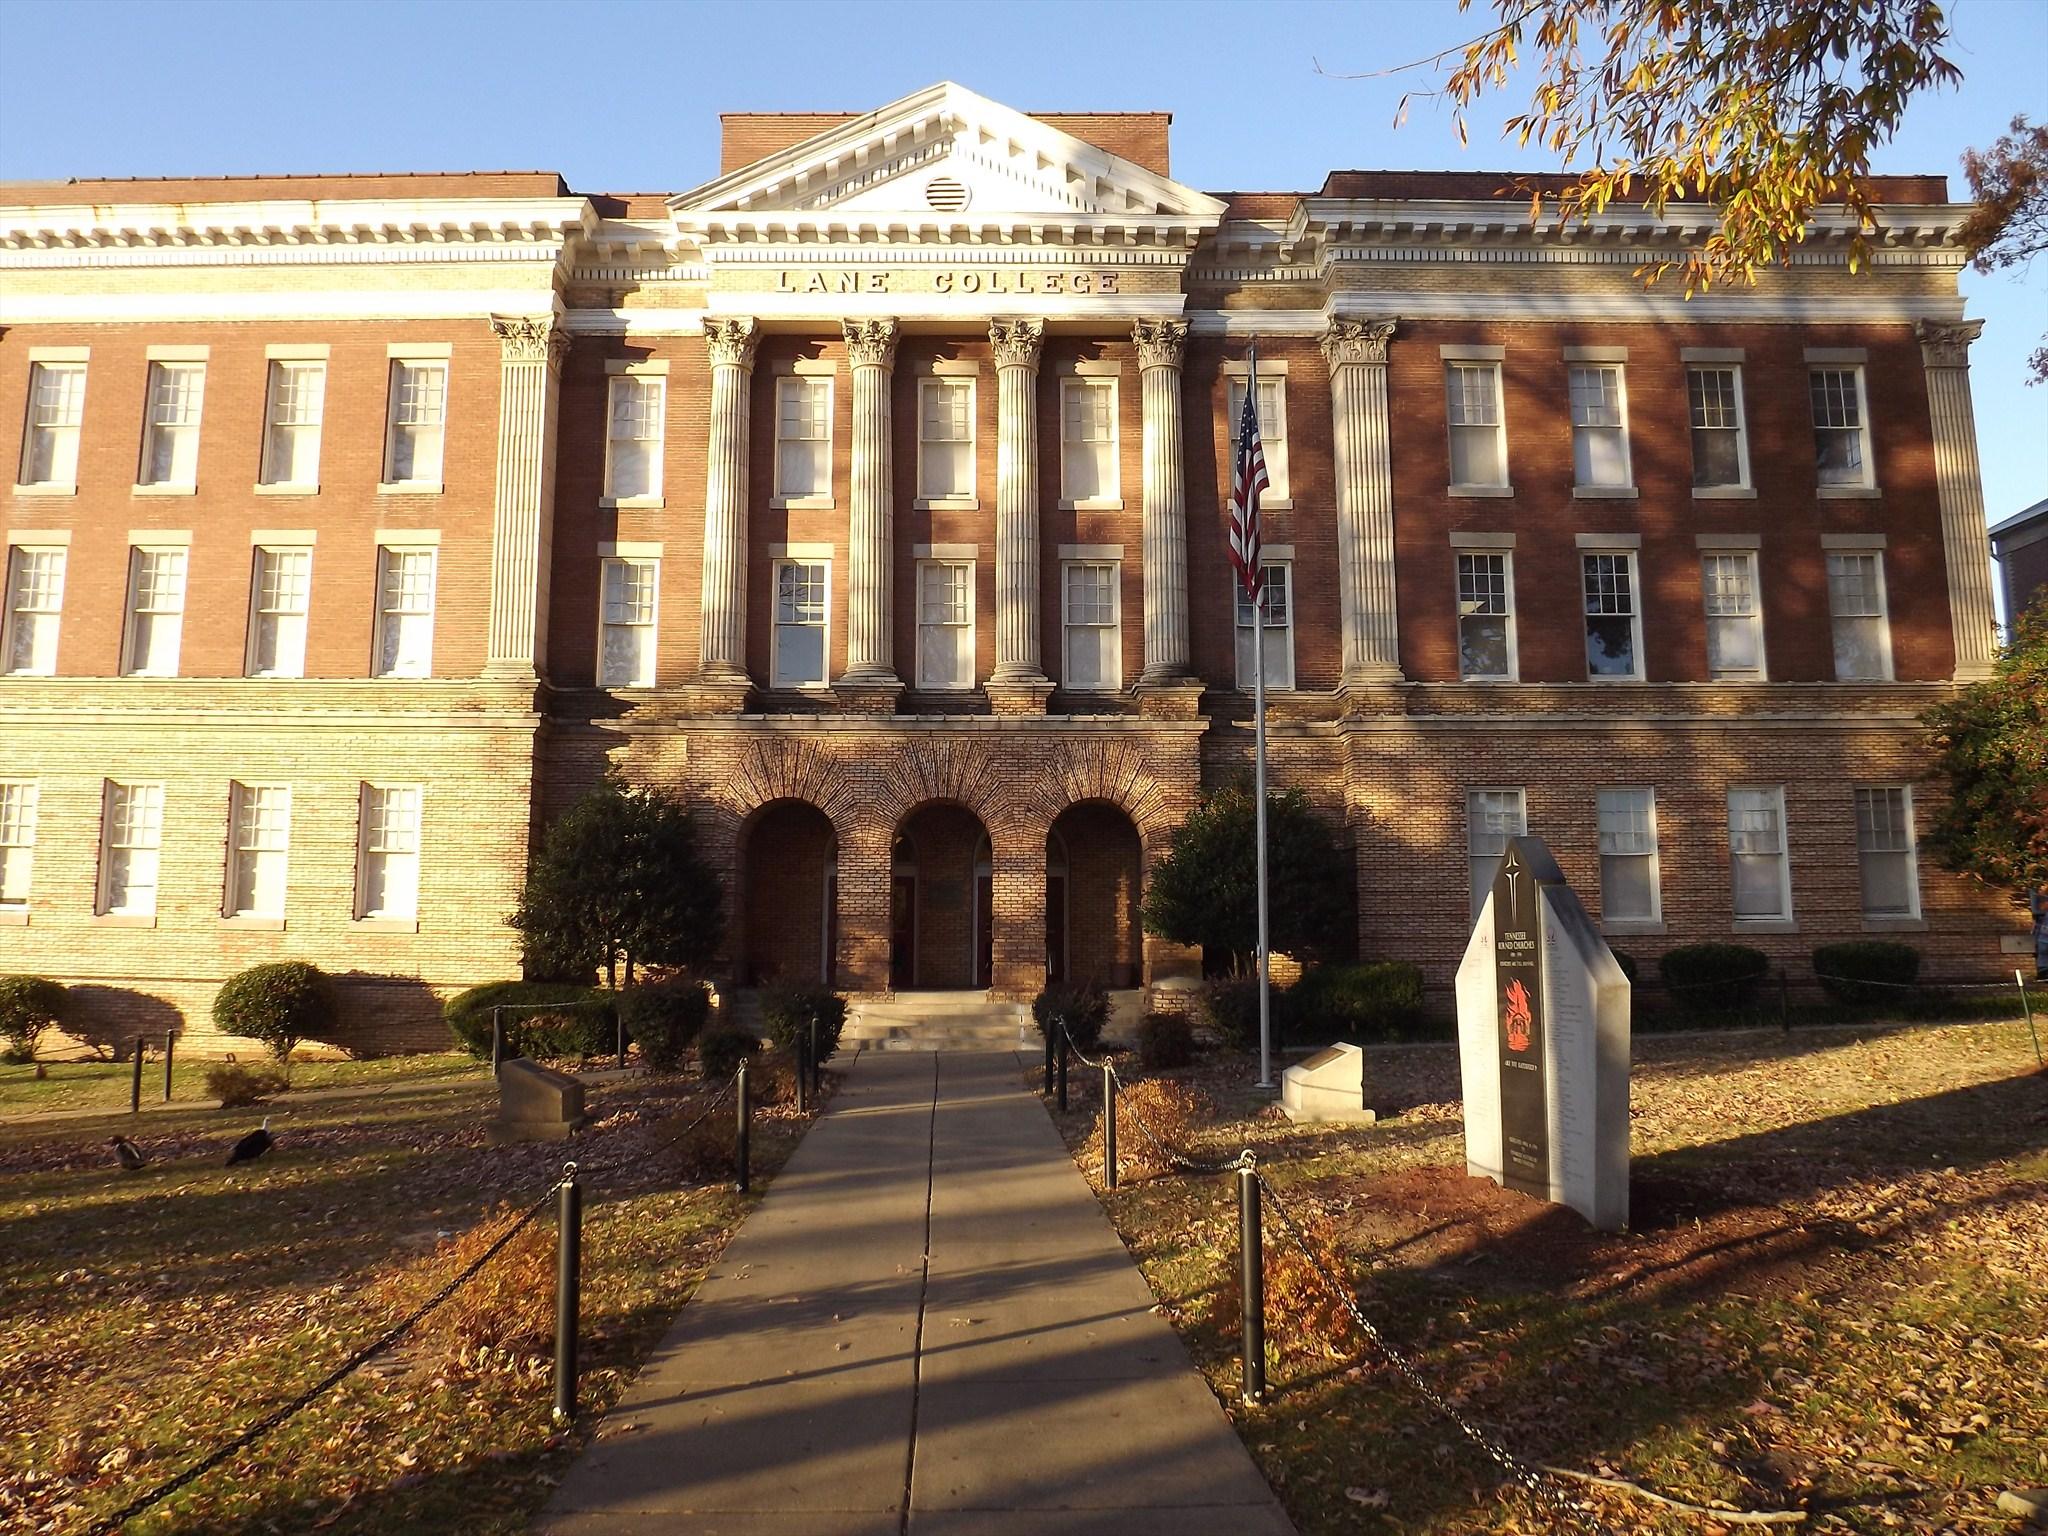 lane college historic district jackson tennessee image